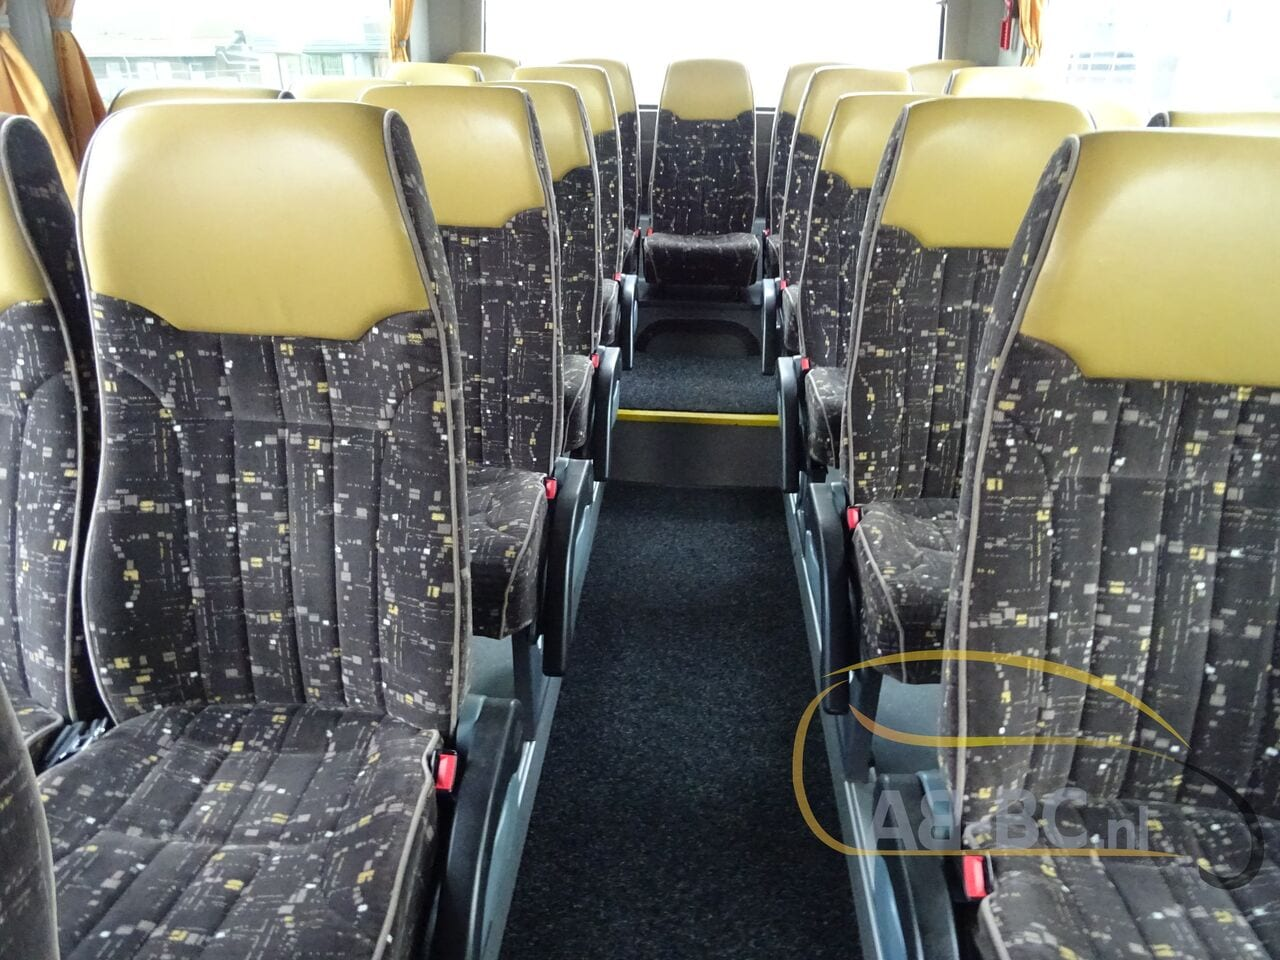 coach-busTEMSA-Safari-HD-51-Seats-EURO5-12-MTR---1614266646256679853_big_e70eb56465246c3d8e05730e461aca53--19052917224730818200